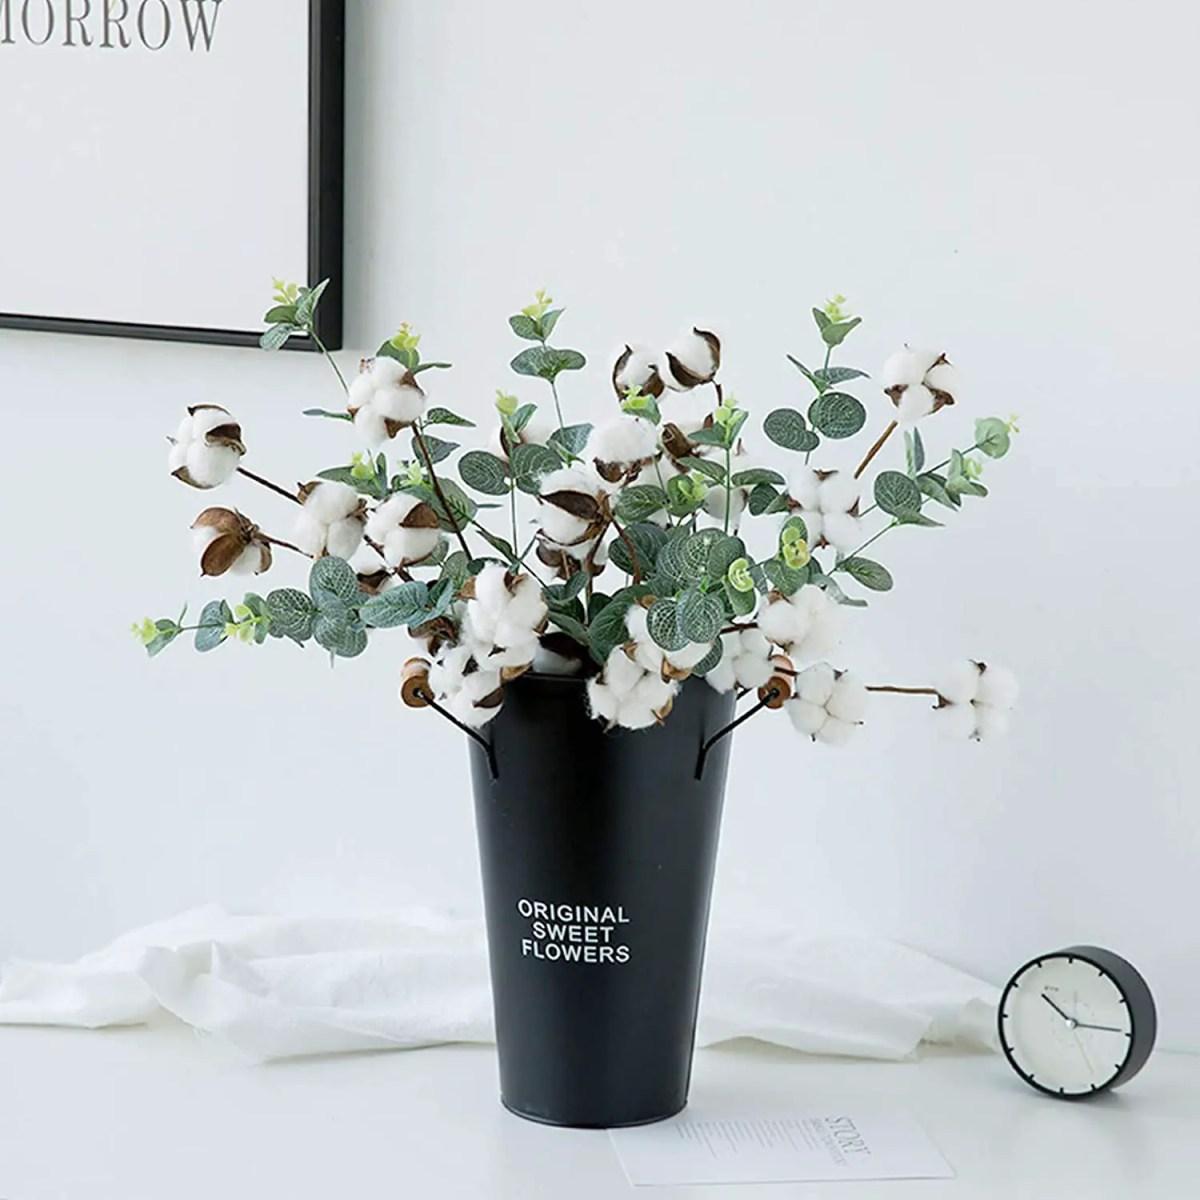 Cotton Stems farmhouse vase decor